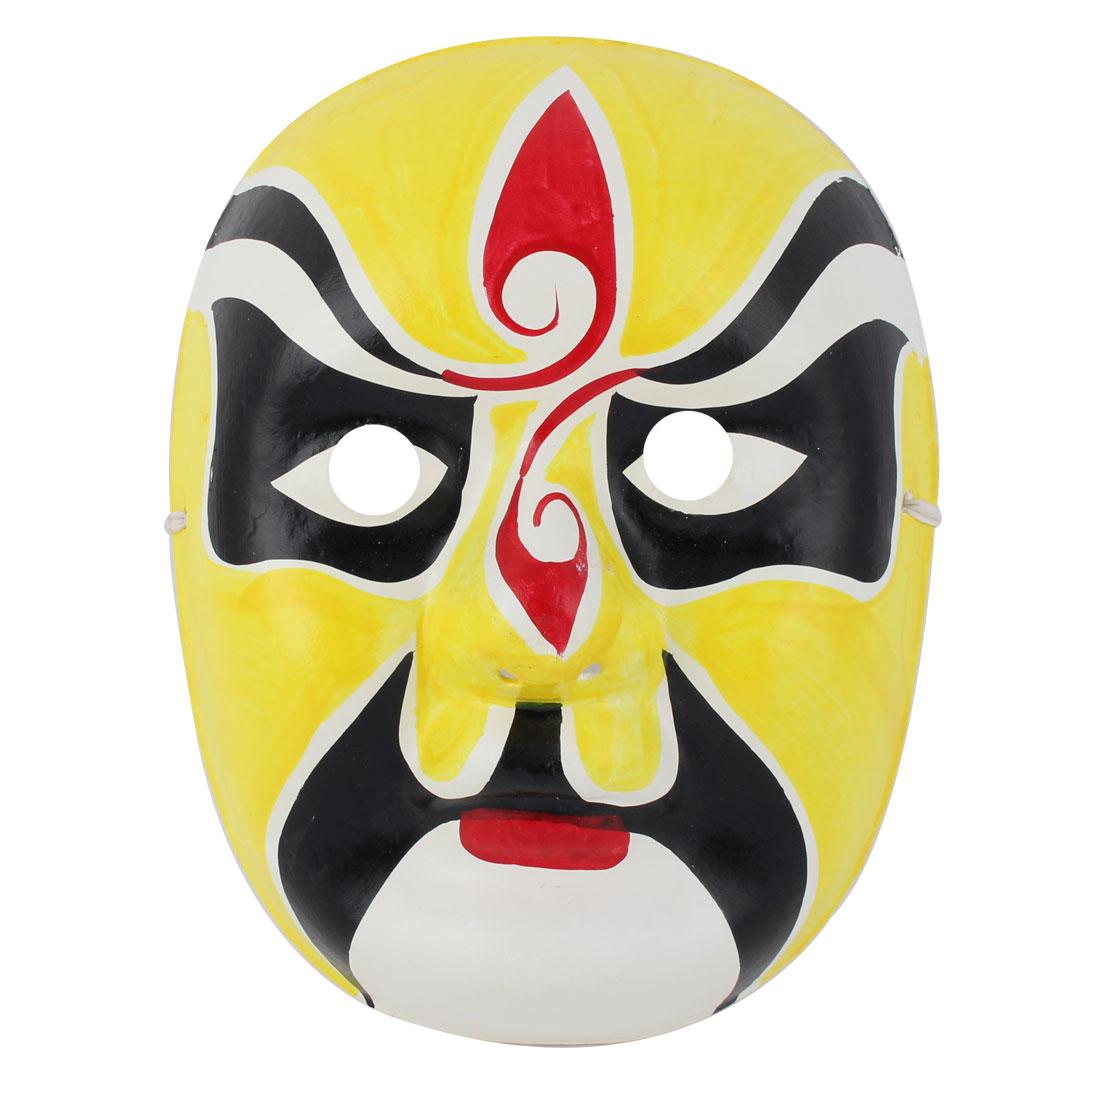 Karneval Cosplay Parties Unisex Decoration Chinese Beijing Opera Face Makeup Mask